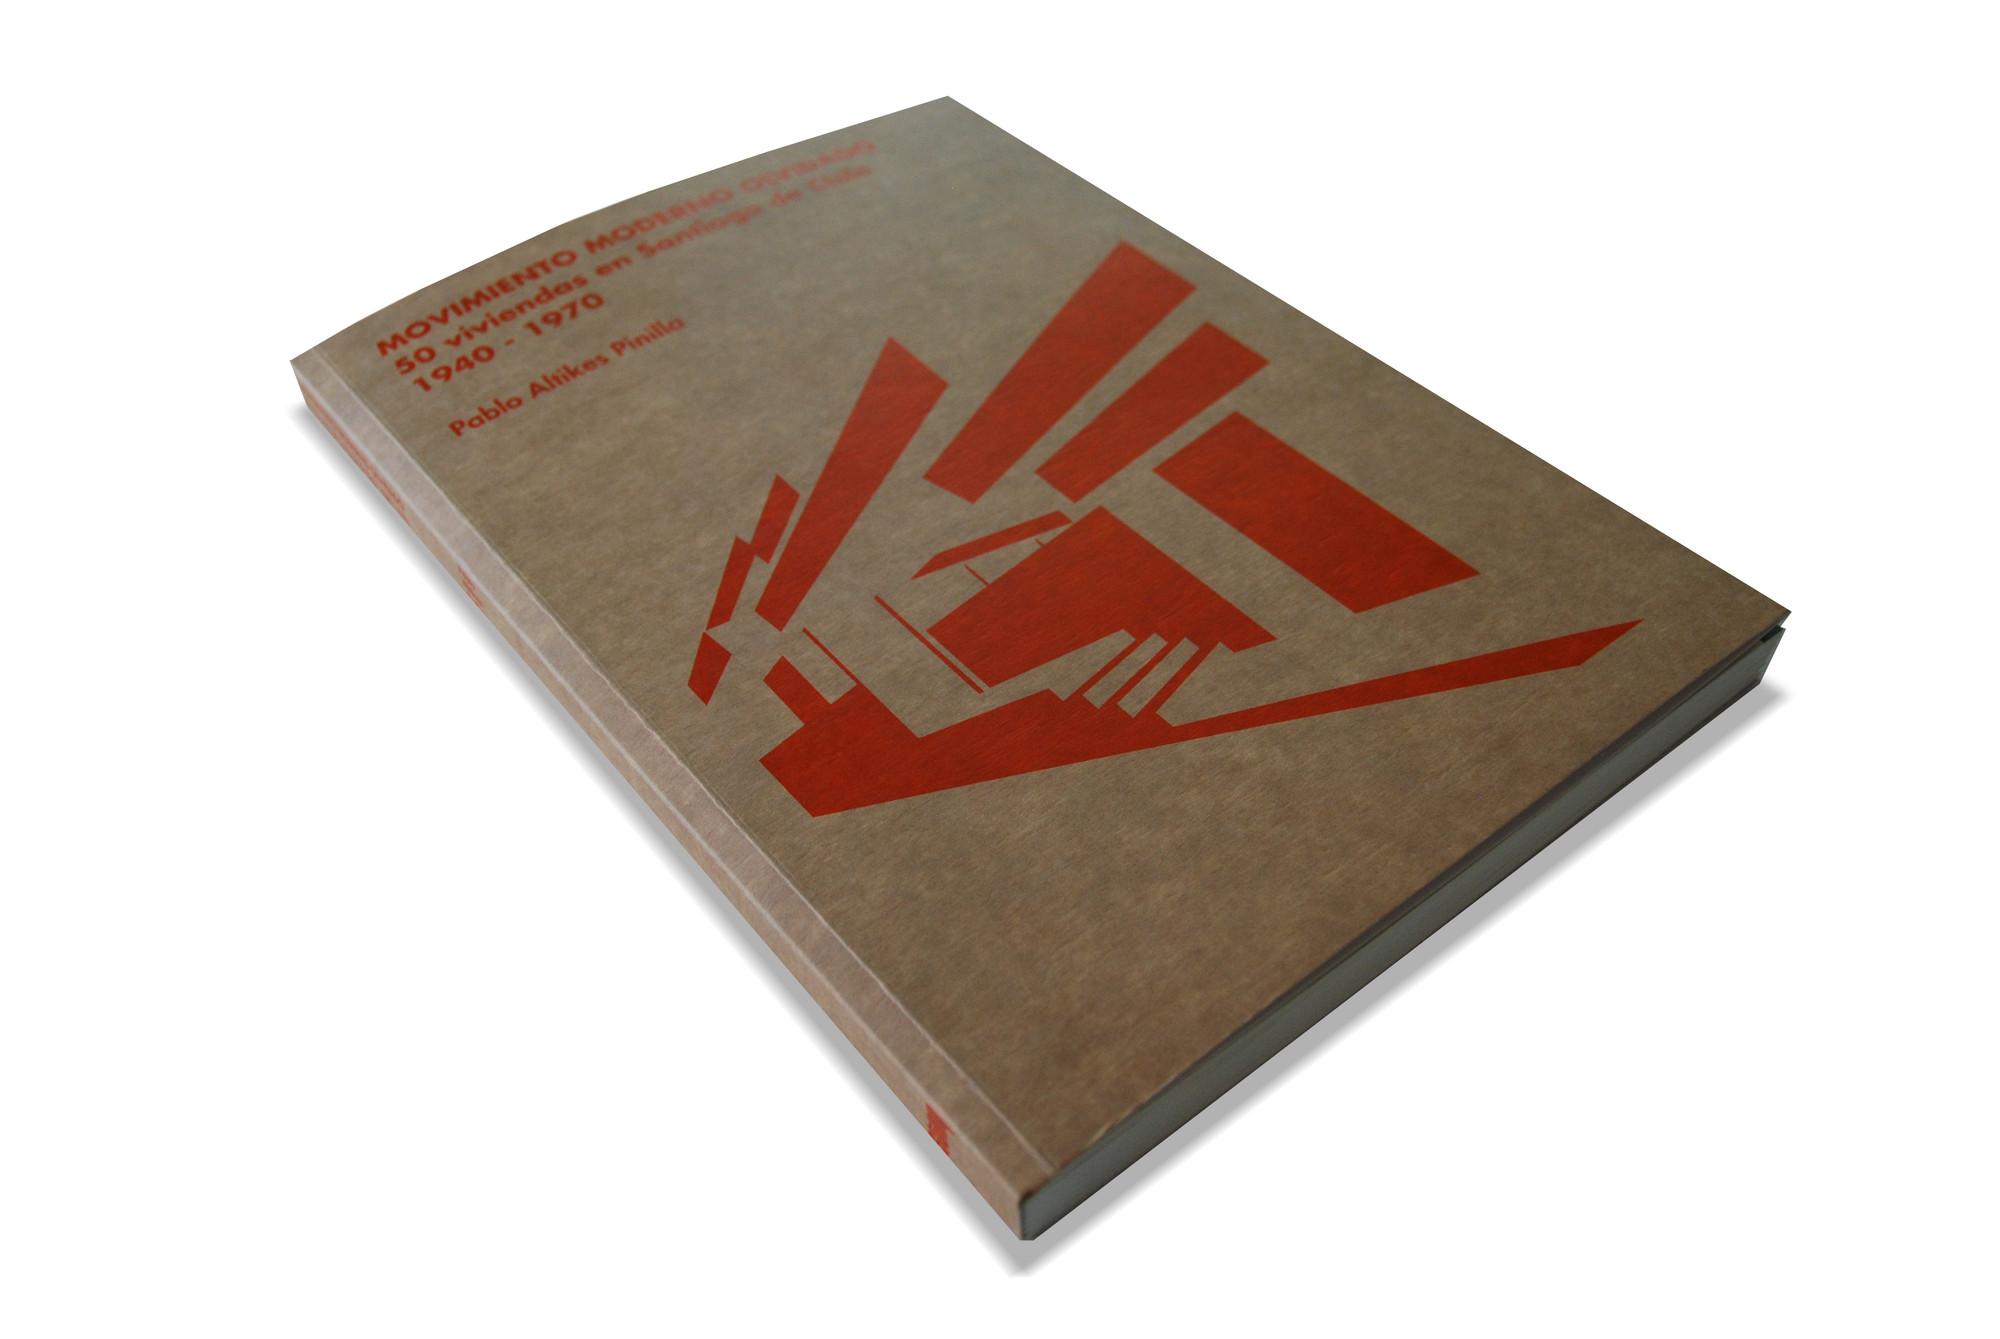 Movimiento Moderno Olvidado l 50 Viviendas en Santiago de Chile 1940-1970 / Pablo Altikes